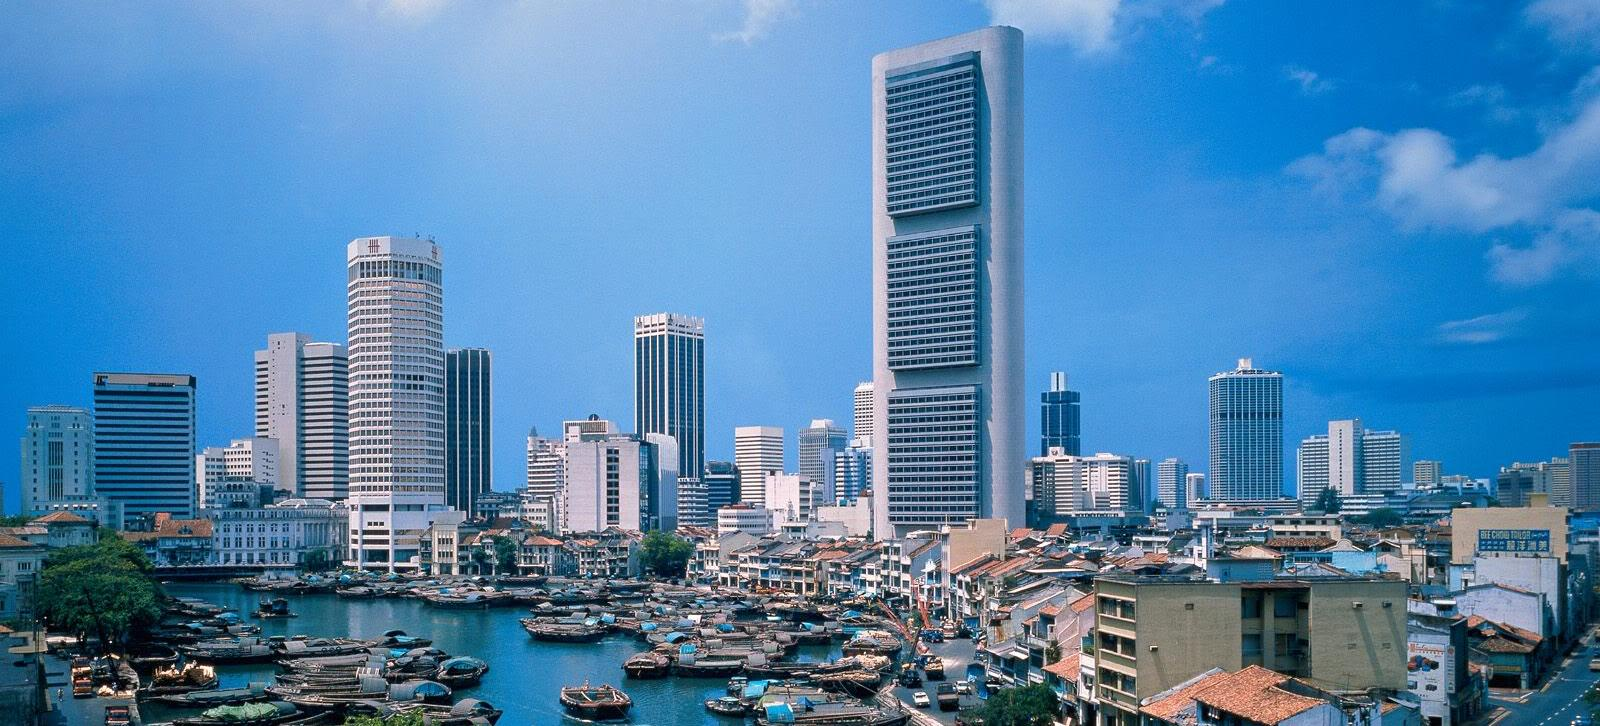 Big singaporeriversingapore